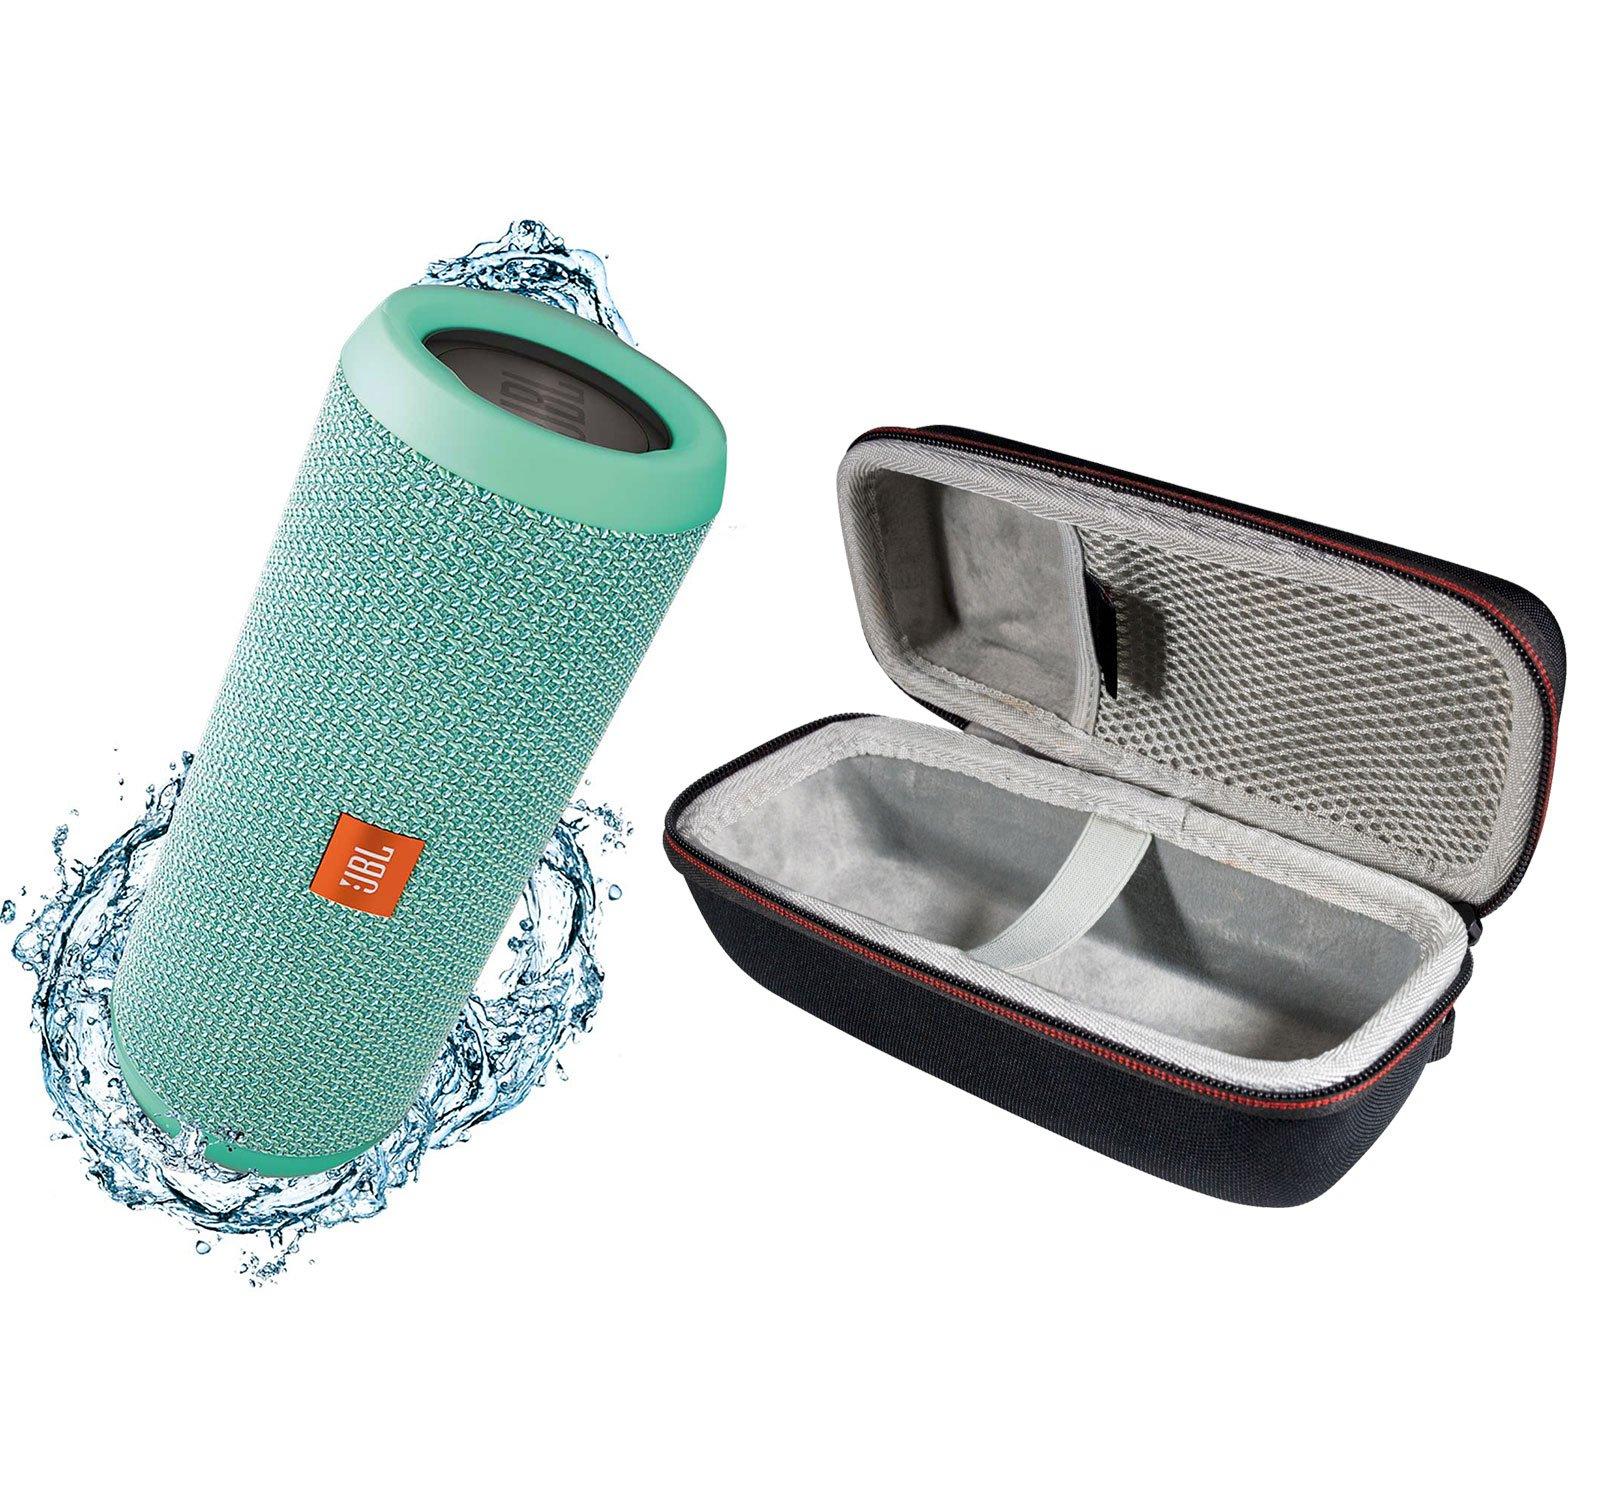 JBL Flip 3 Portable Splashproof Bluetooth Wireless Speaker Bundle with Hardshell Case - Teal